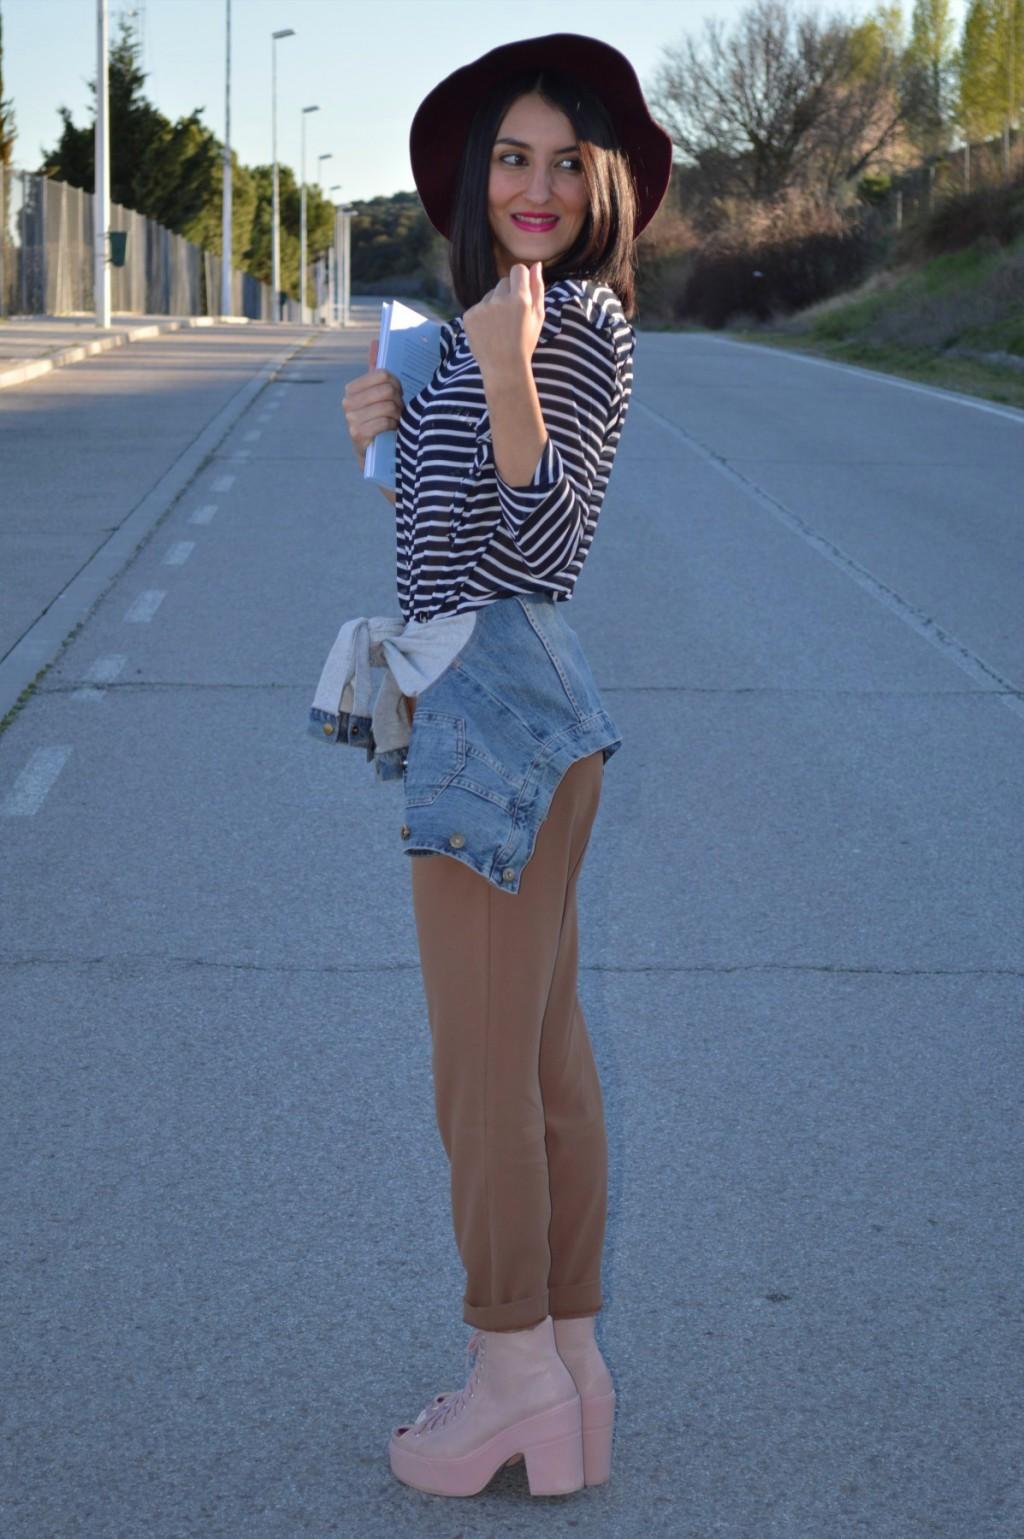 Cazadora vaquera / denim jacket: Tezenis Blusa / blouse: Bershka (New) Pantalones / pants: Mango Botas / boots: Topshop Sombrero / hat: Parfois